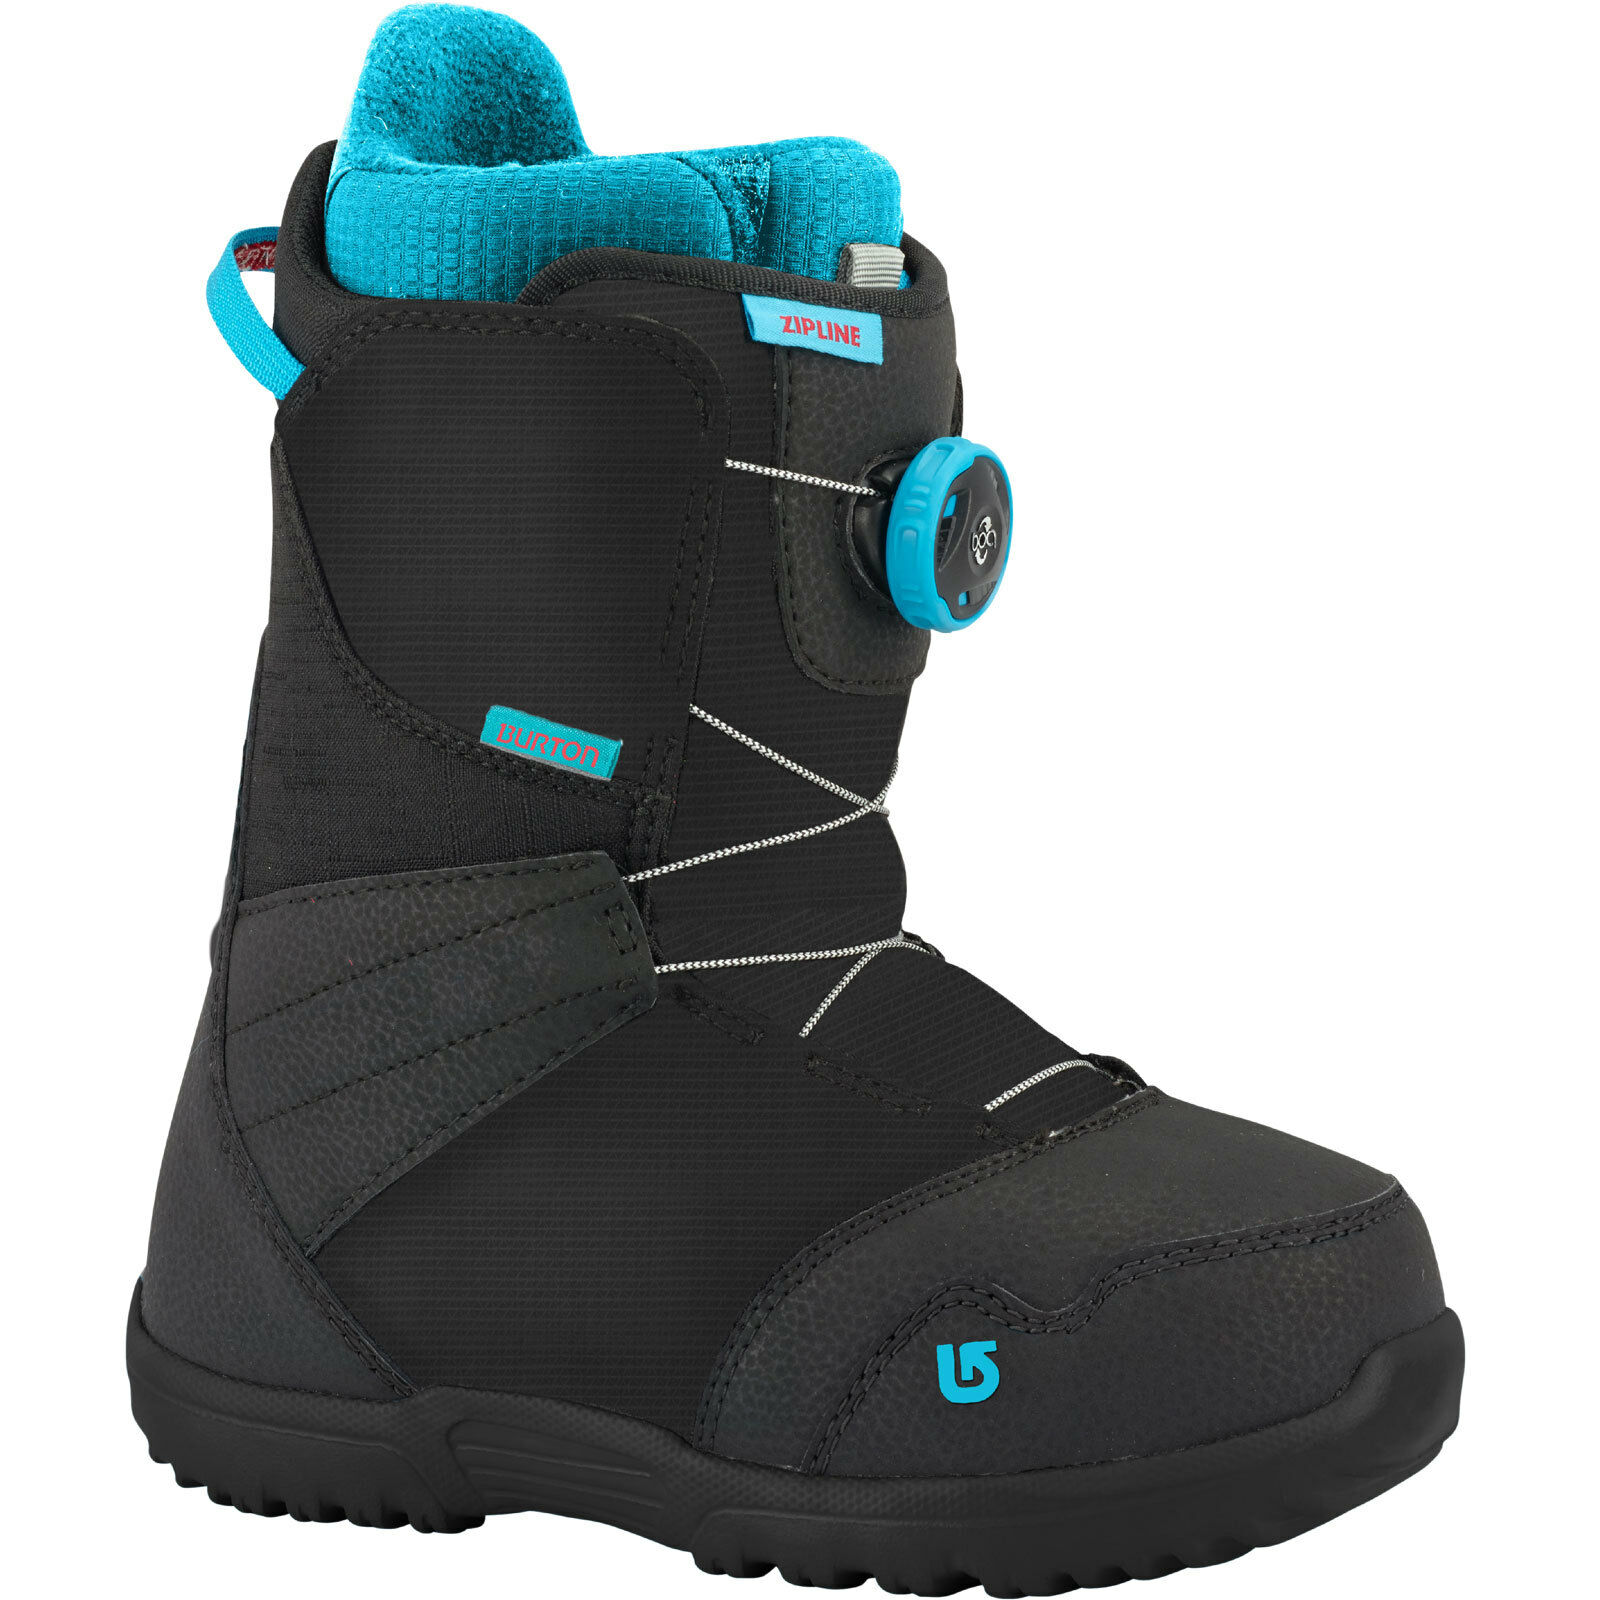 Burton Zipline Zip-Line Zip-Line Zip-Line BOA Kinder Snowboardschuhe SnowboardStiefel SoftStiefel NEU e237e2